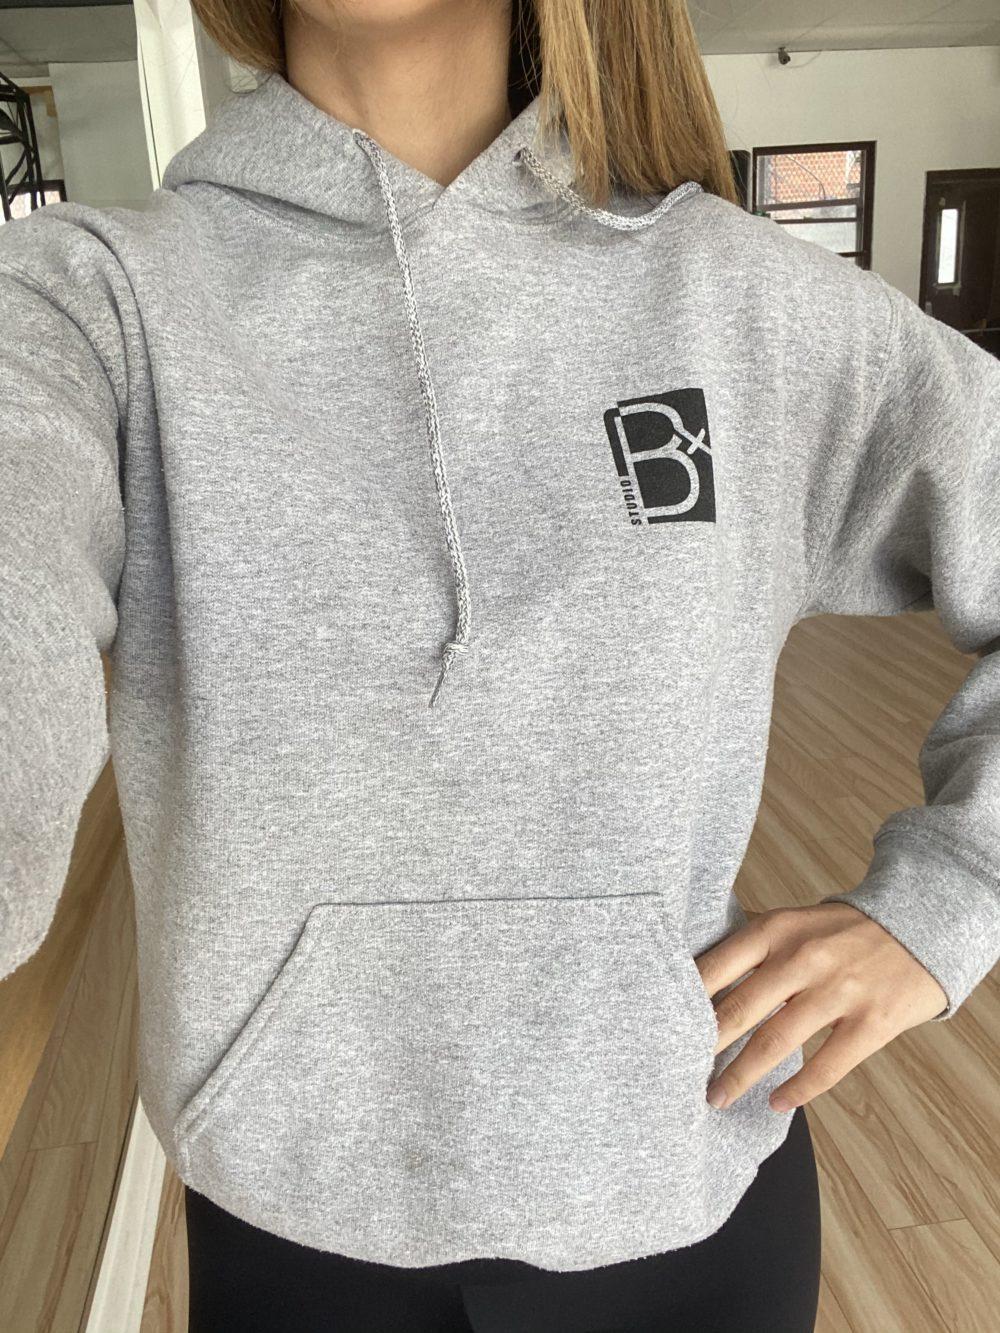 kangourou-pull-hoodie-bx-studio-montreal-boutique